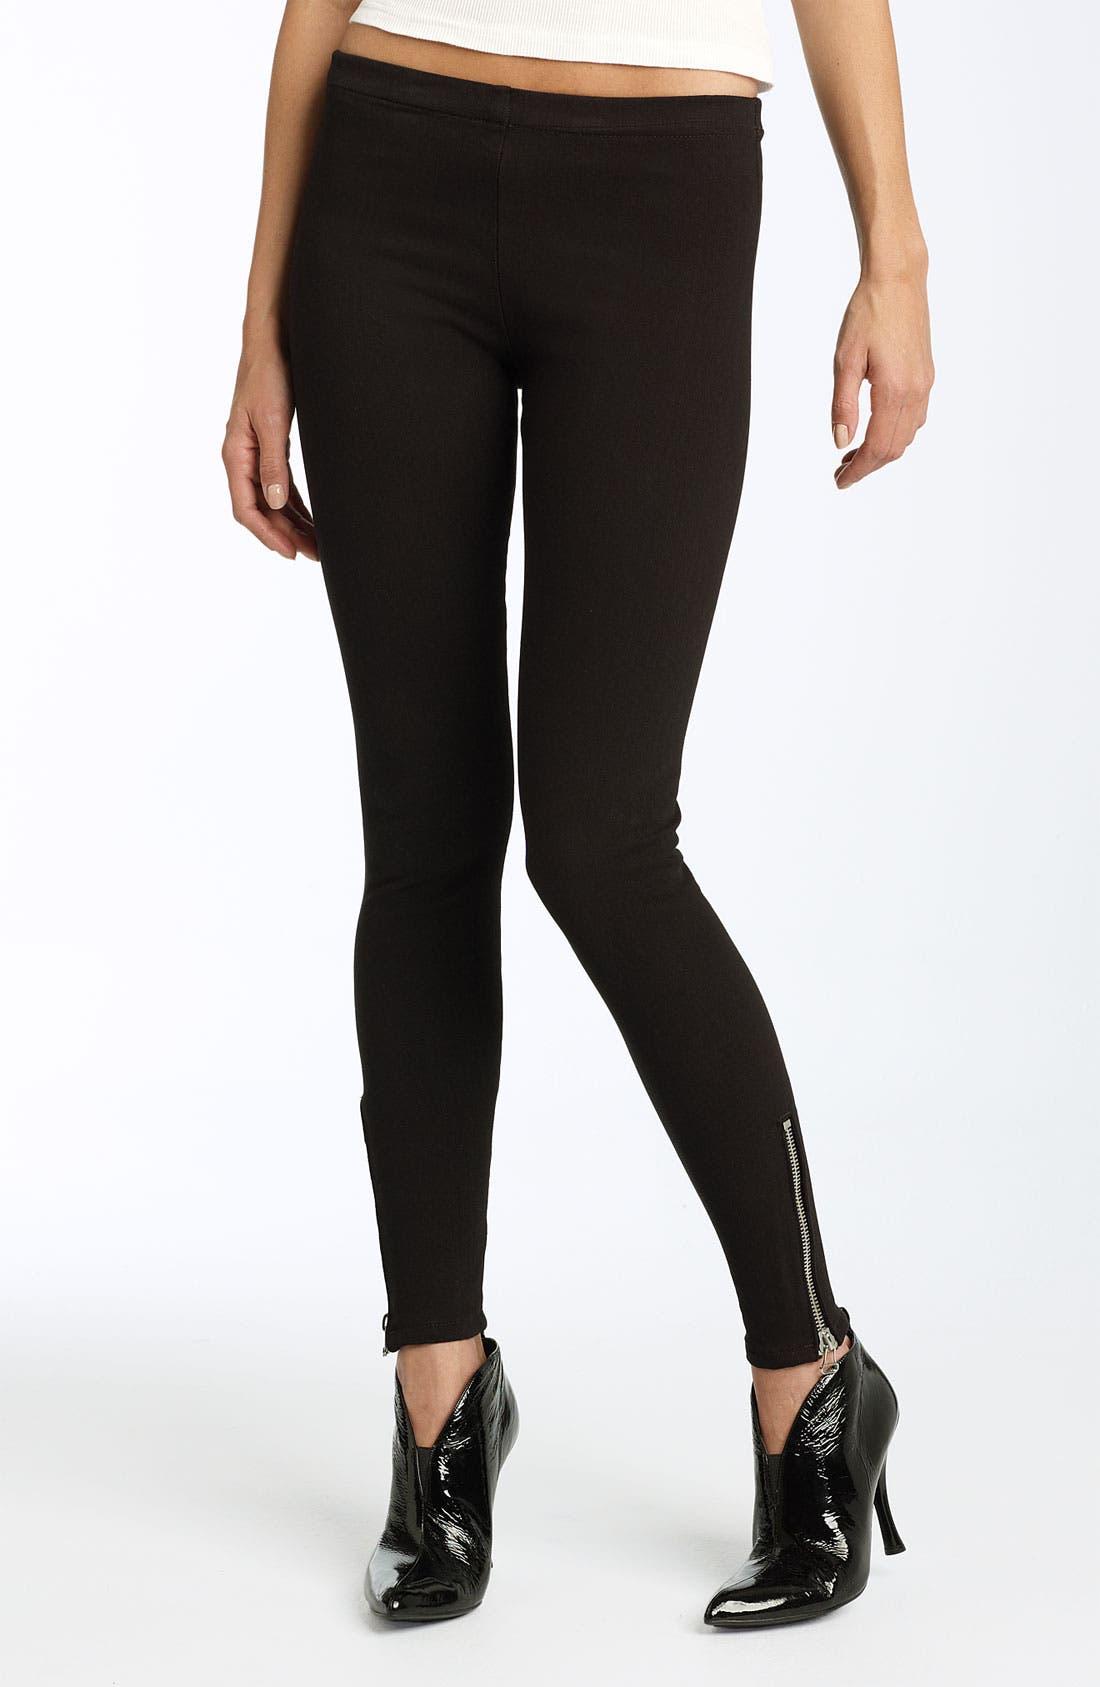 Main Image - Joe's Jeans Side Zip Hem Stretch Denim Leggings (Black Wash)